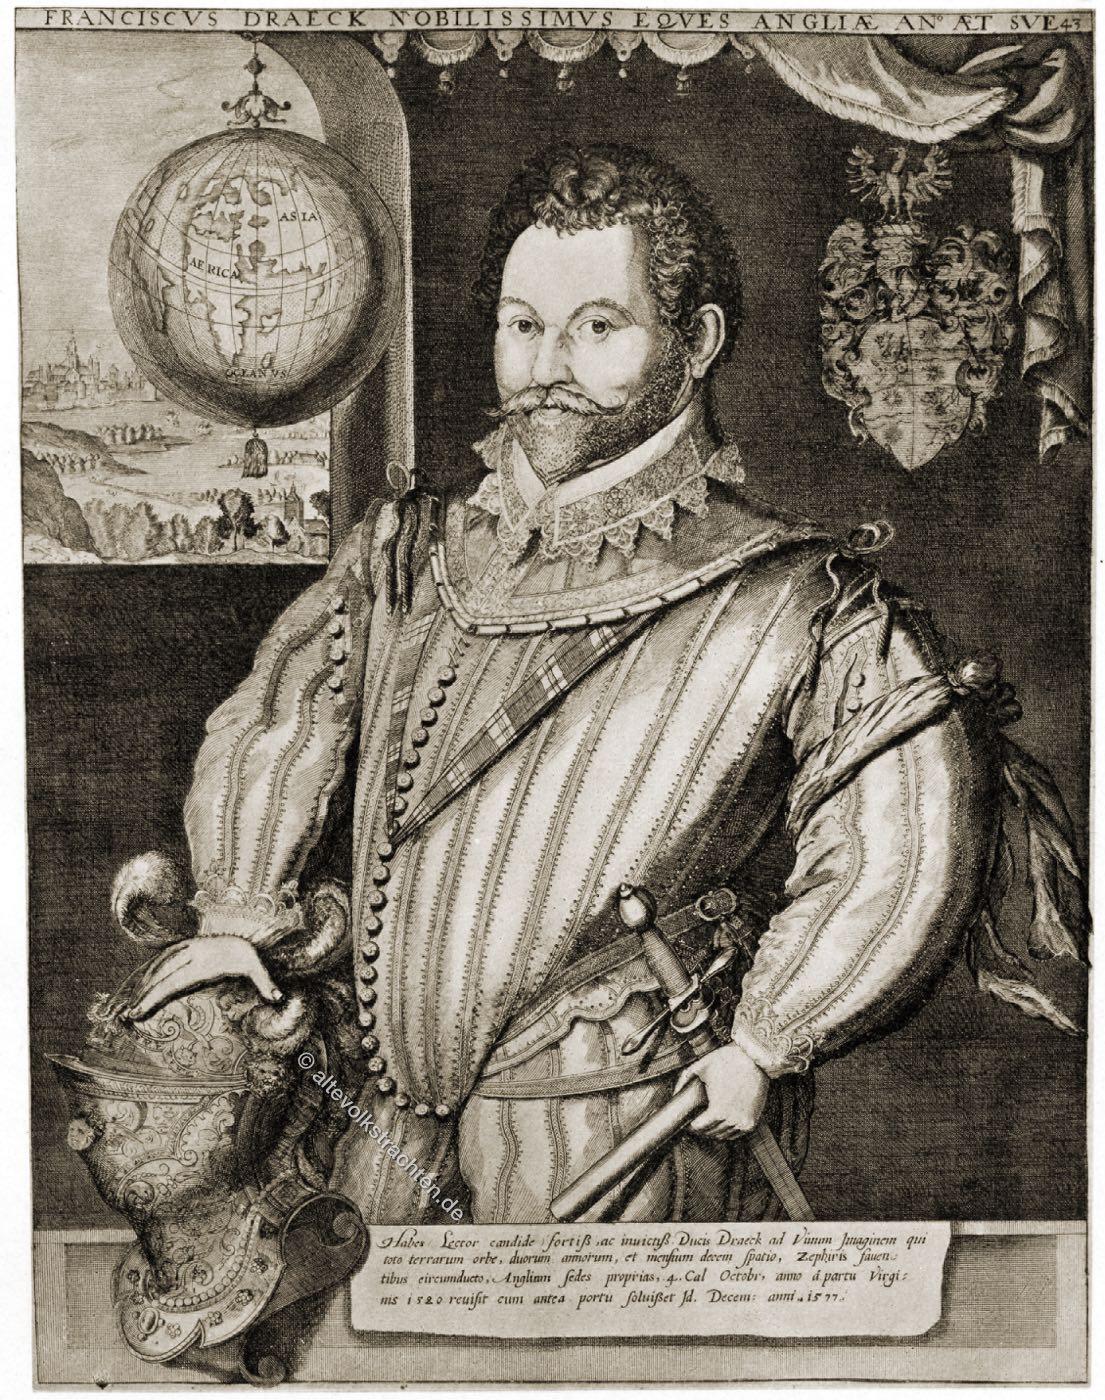 Sir, Francis, Drake, Tudor, Mode, England, Seemann, Renaissance, Freibeuter, Pirat